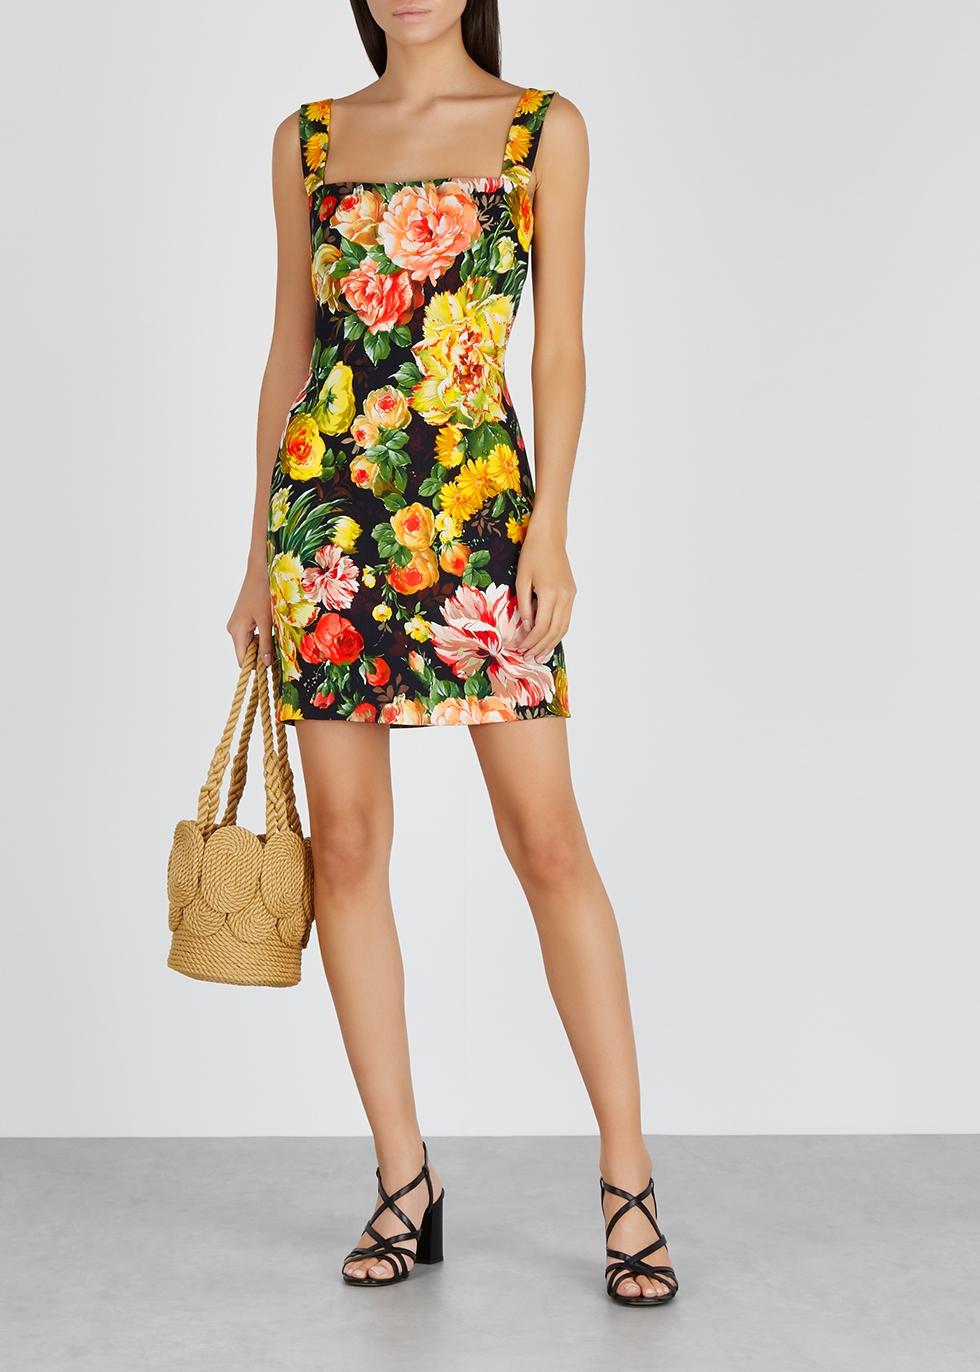 c1becafa83 Designer Dresses   Designer Gowns - Harvey Nichols